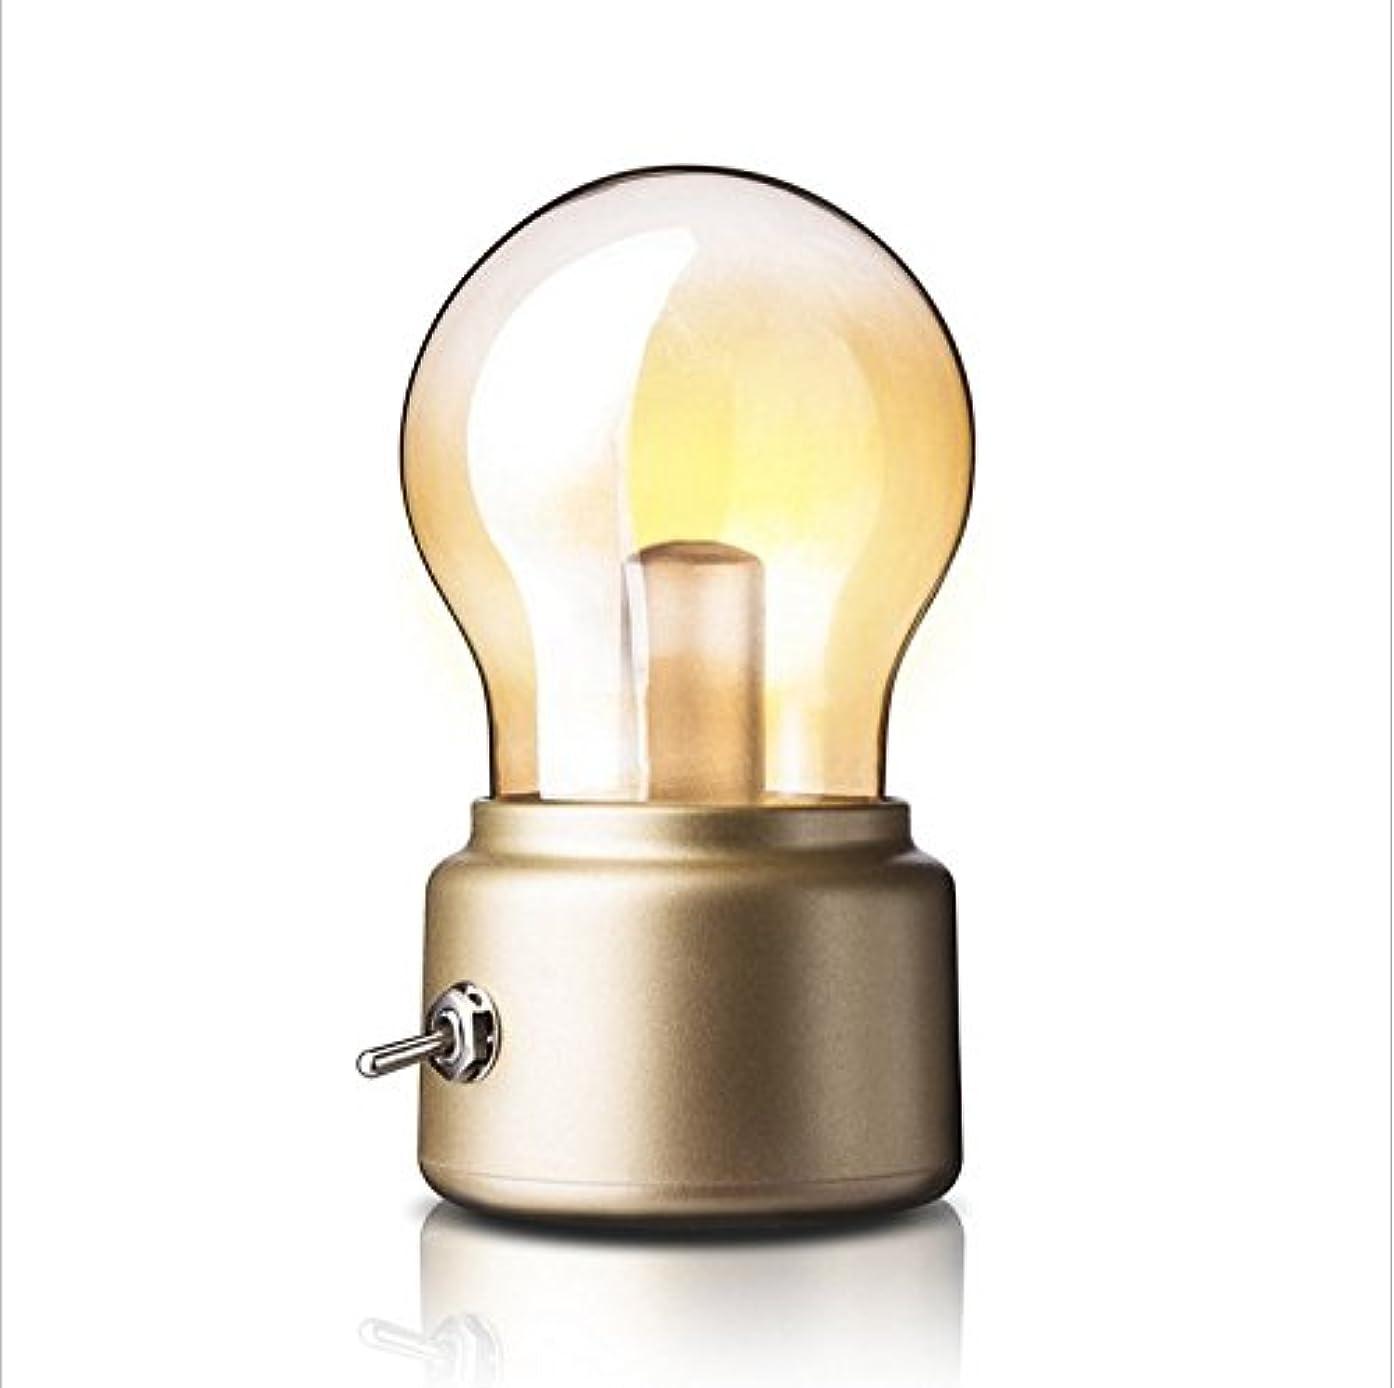 New England retro bulb lights highlight LED night light to restore ancient ways small desk lamp charging creative light a night light (gold)